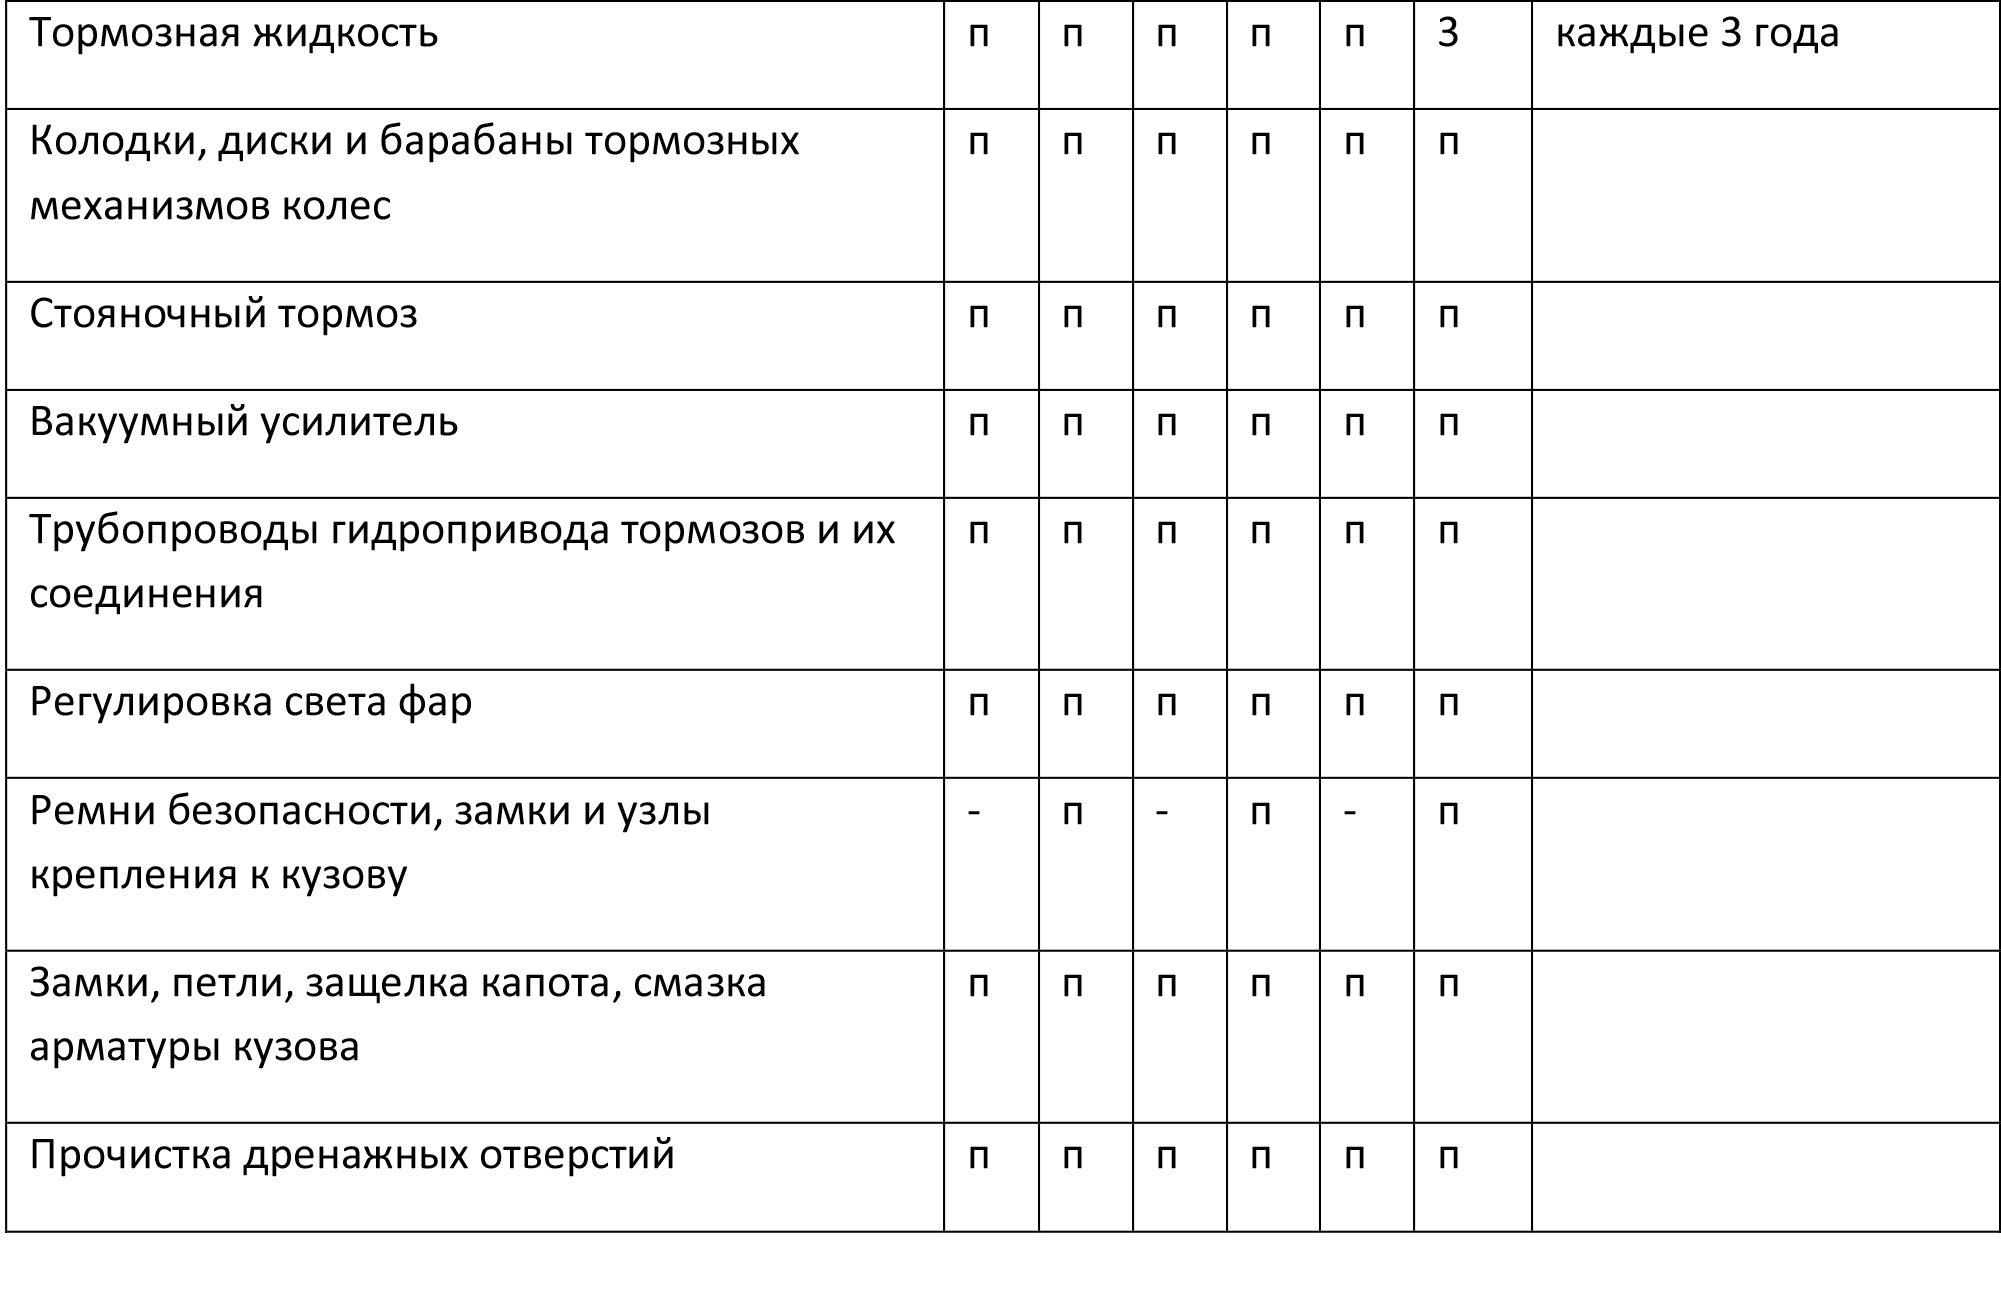 http://spb-logan.ru/images/upload/Интервал-обслуживания-2.jpg